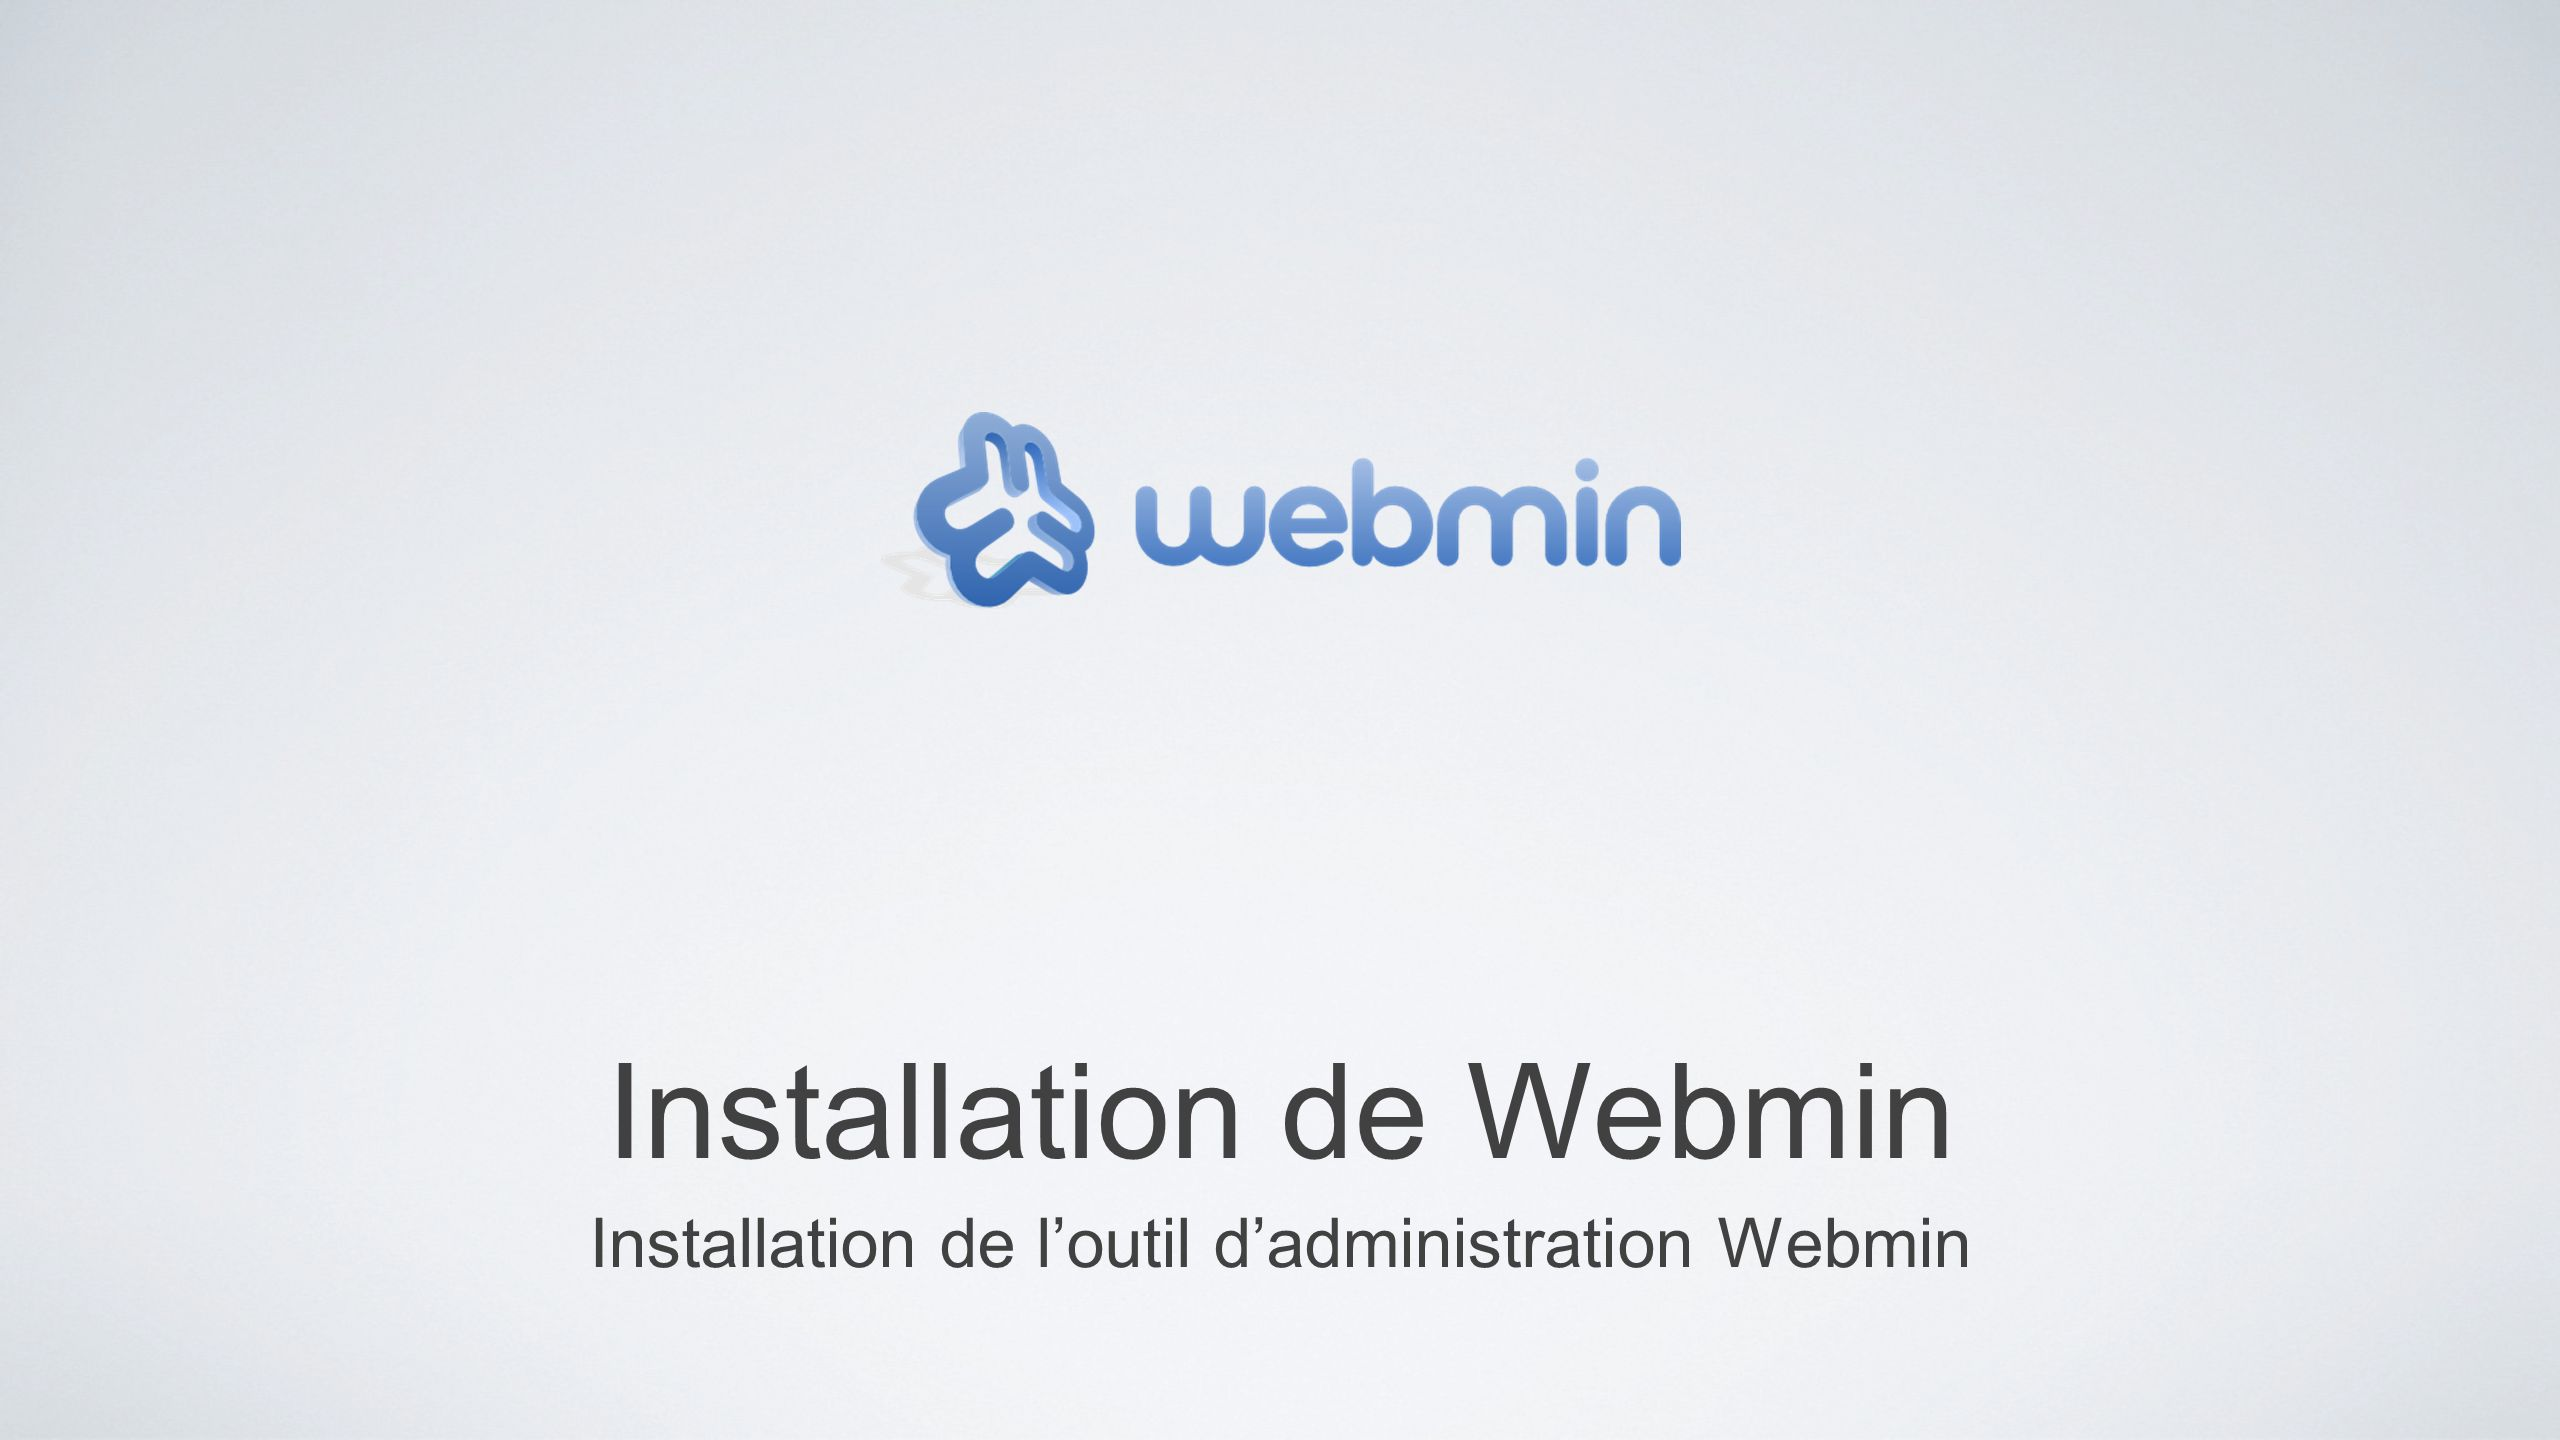 Installation de Webmin